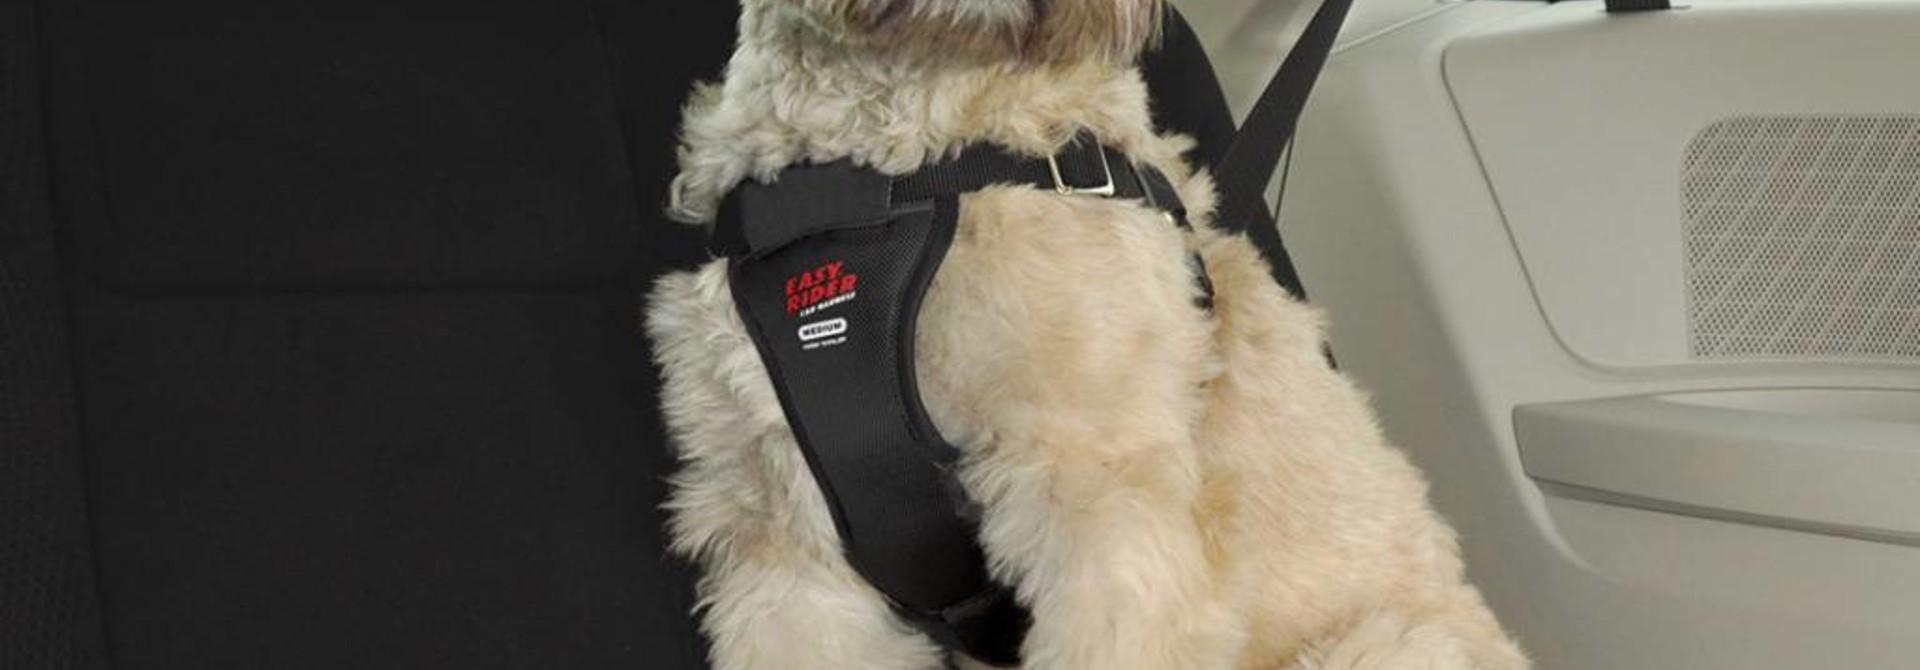 Easy Rider Seat Belt Accessory